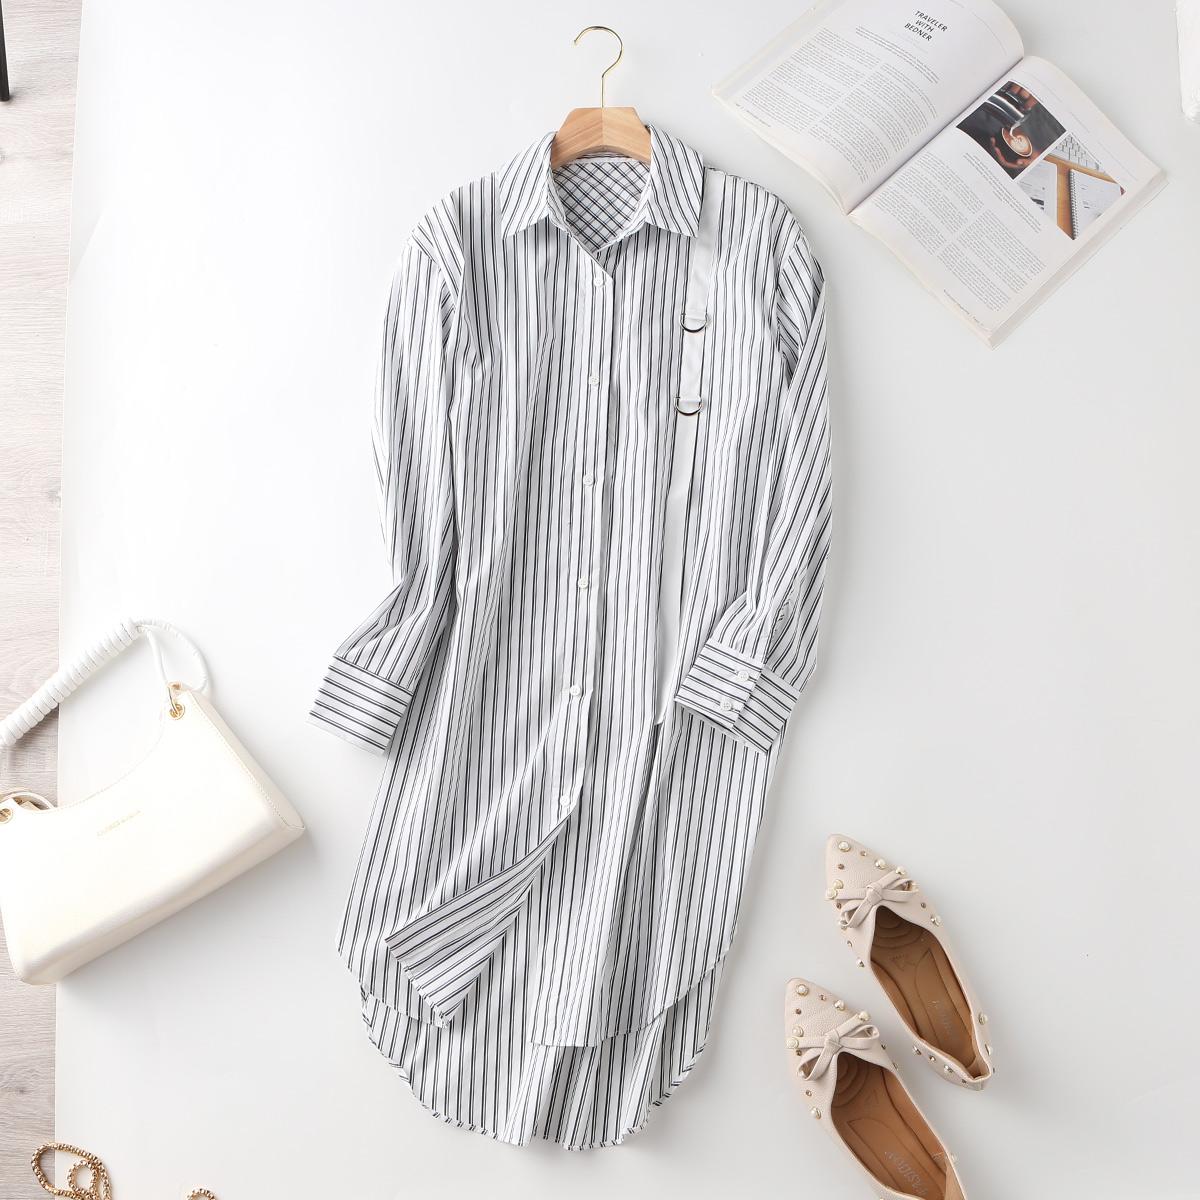 Shibaoer fashion stripe contrast color shirt womens long sleeve autumn new cardigan womens top